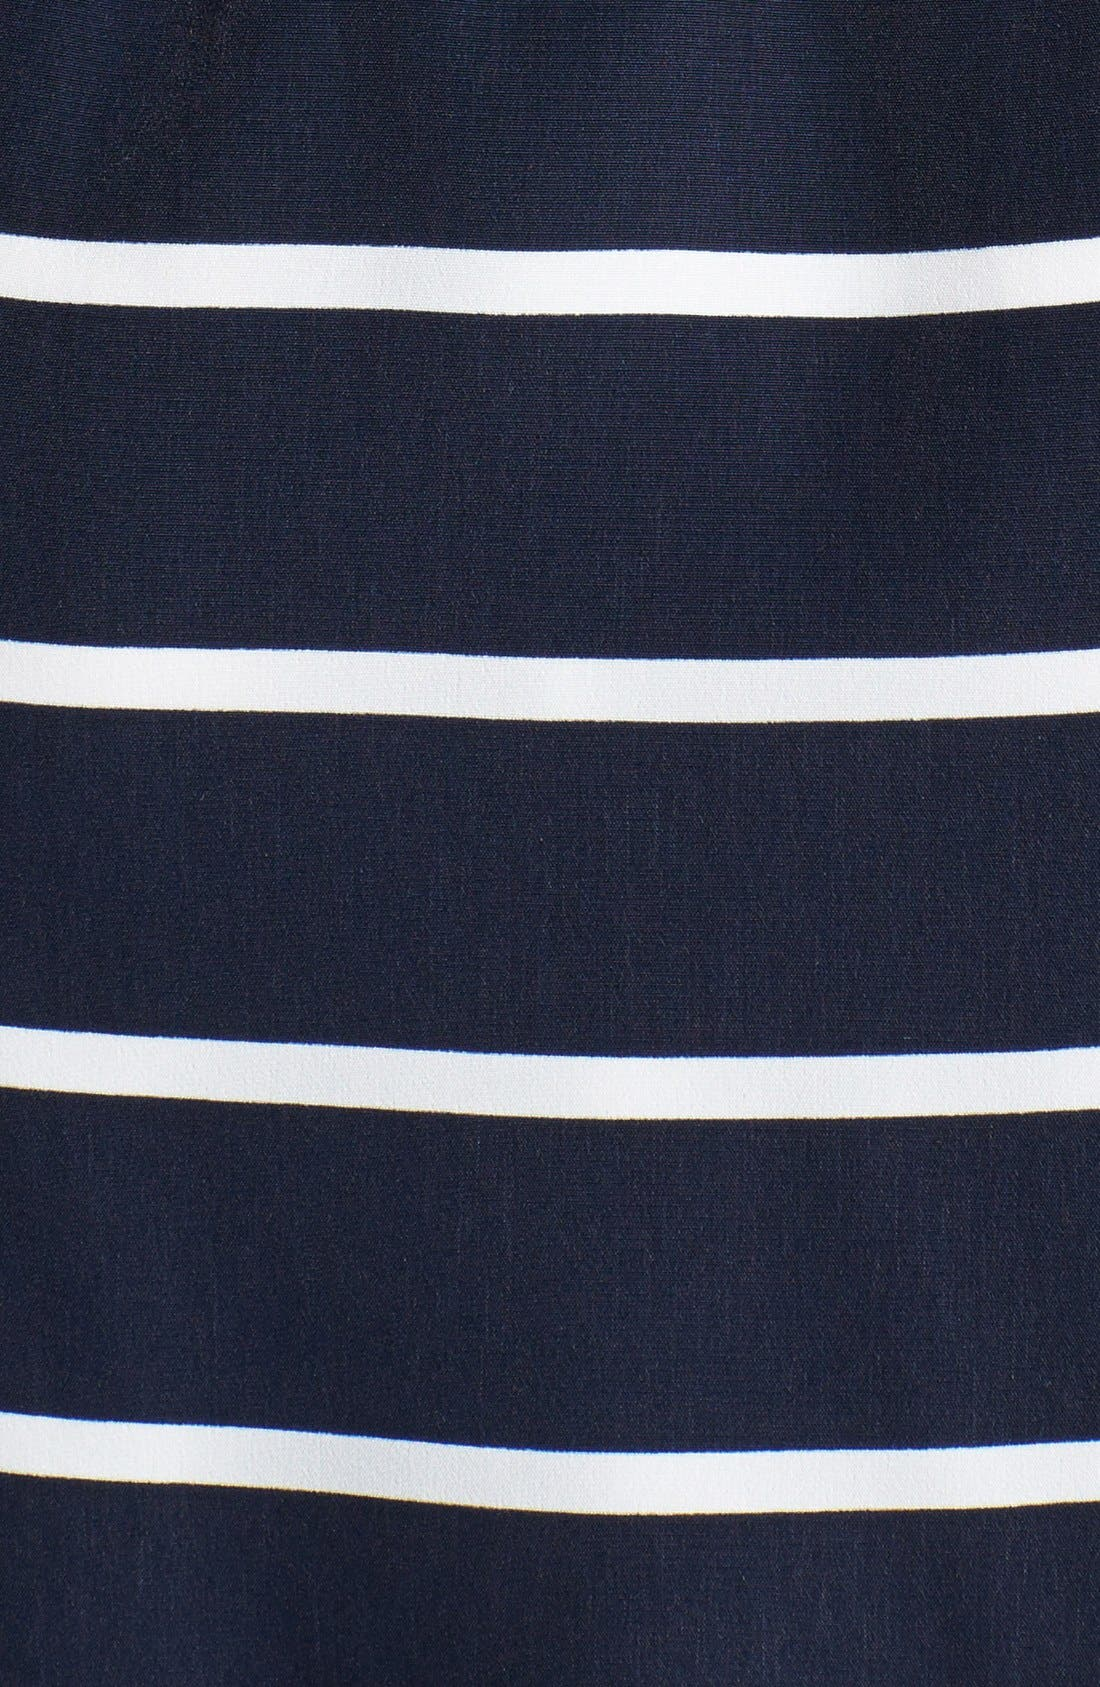 Alternate Image 3  - Vince Camuto 'Yacht Stripe' Mixed Print Dress (Regular & Petite)